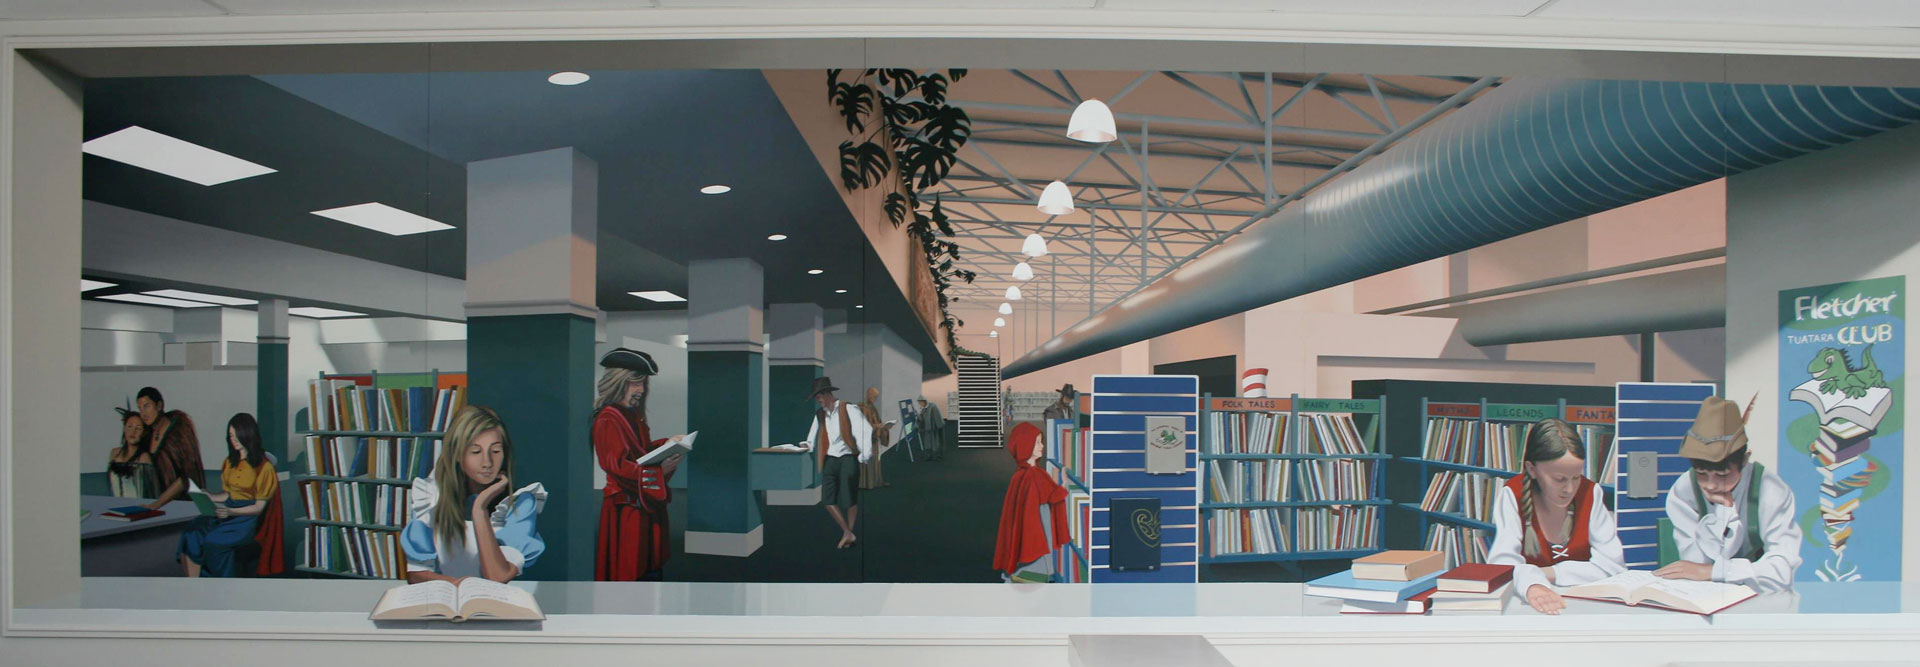 library-rotorua-1920x667 Illusion murals